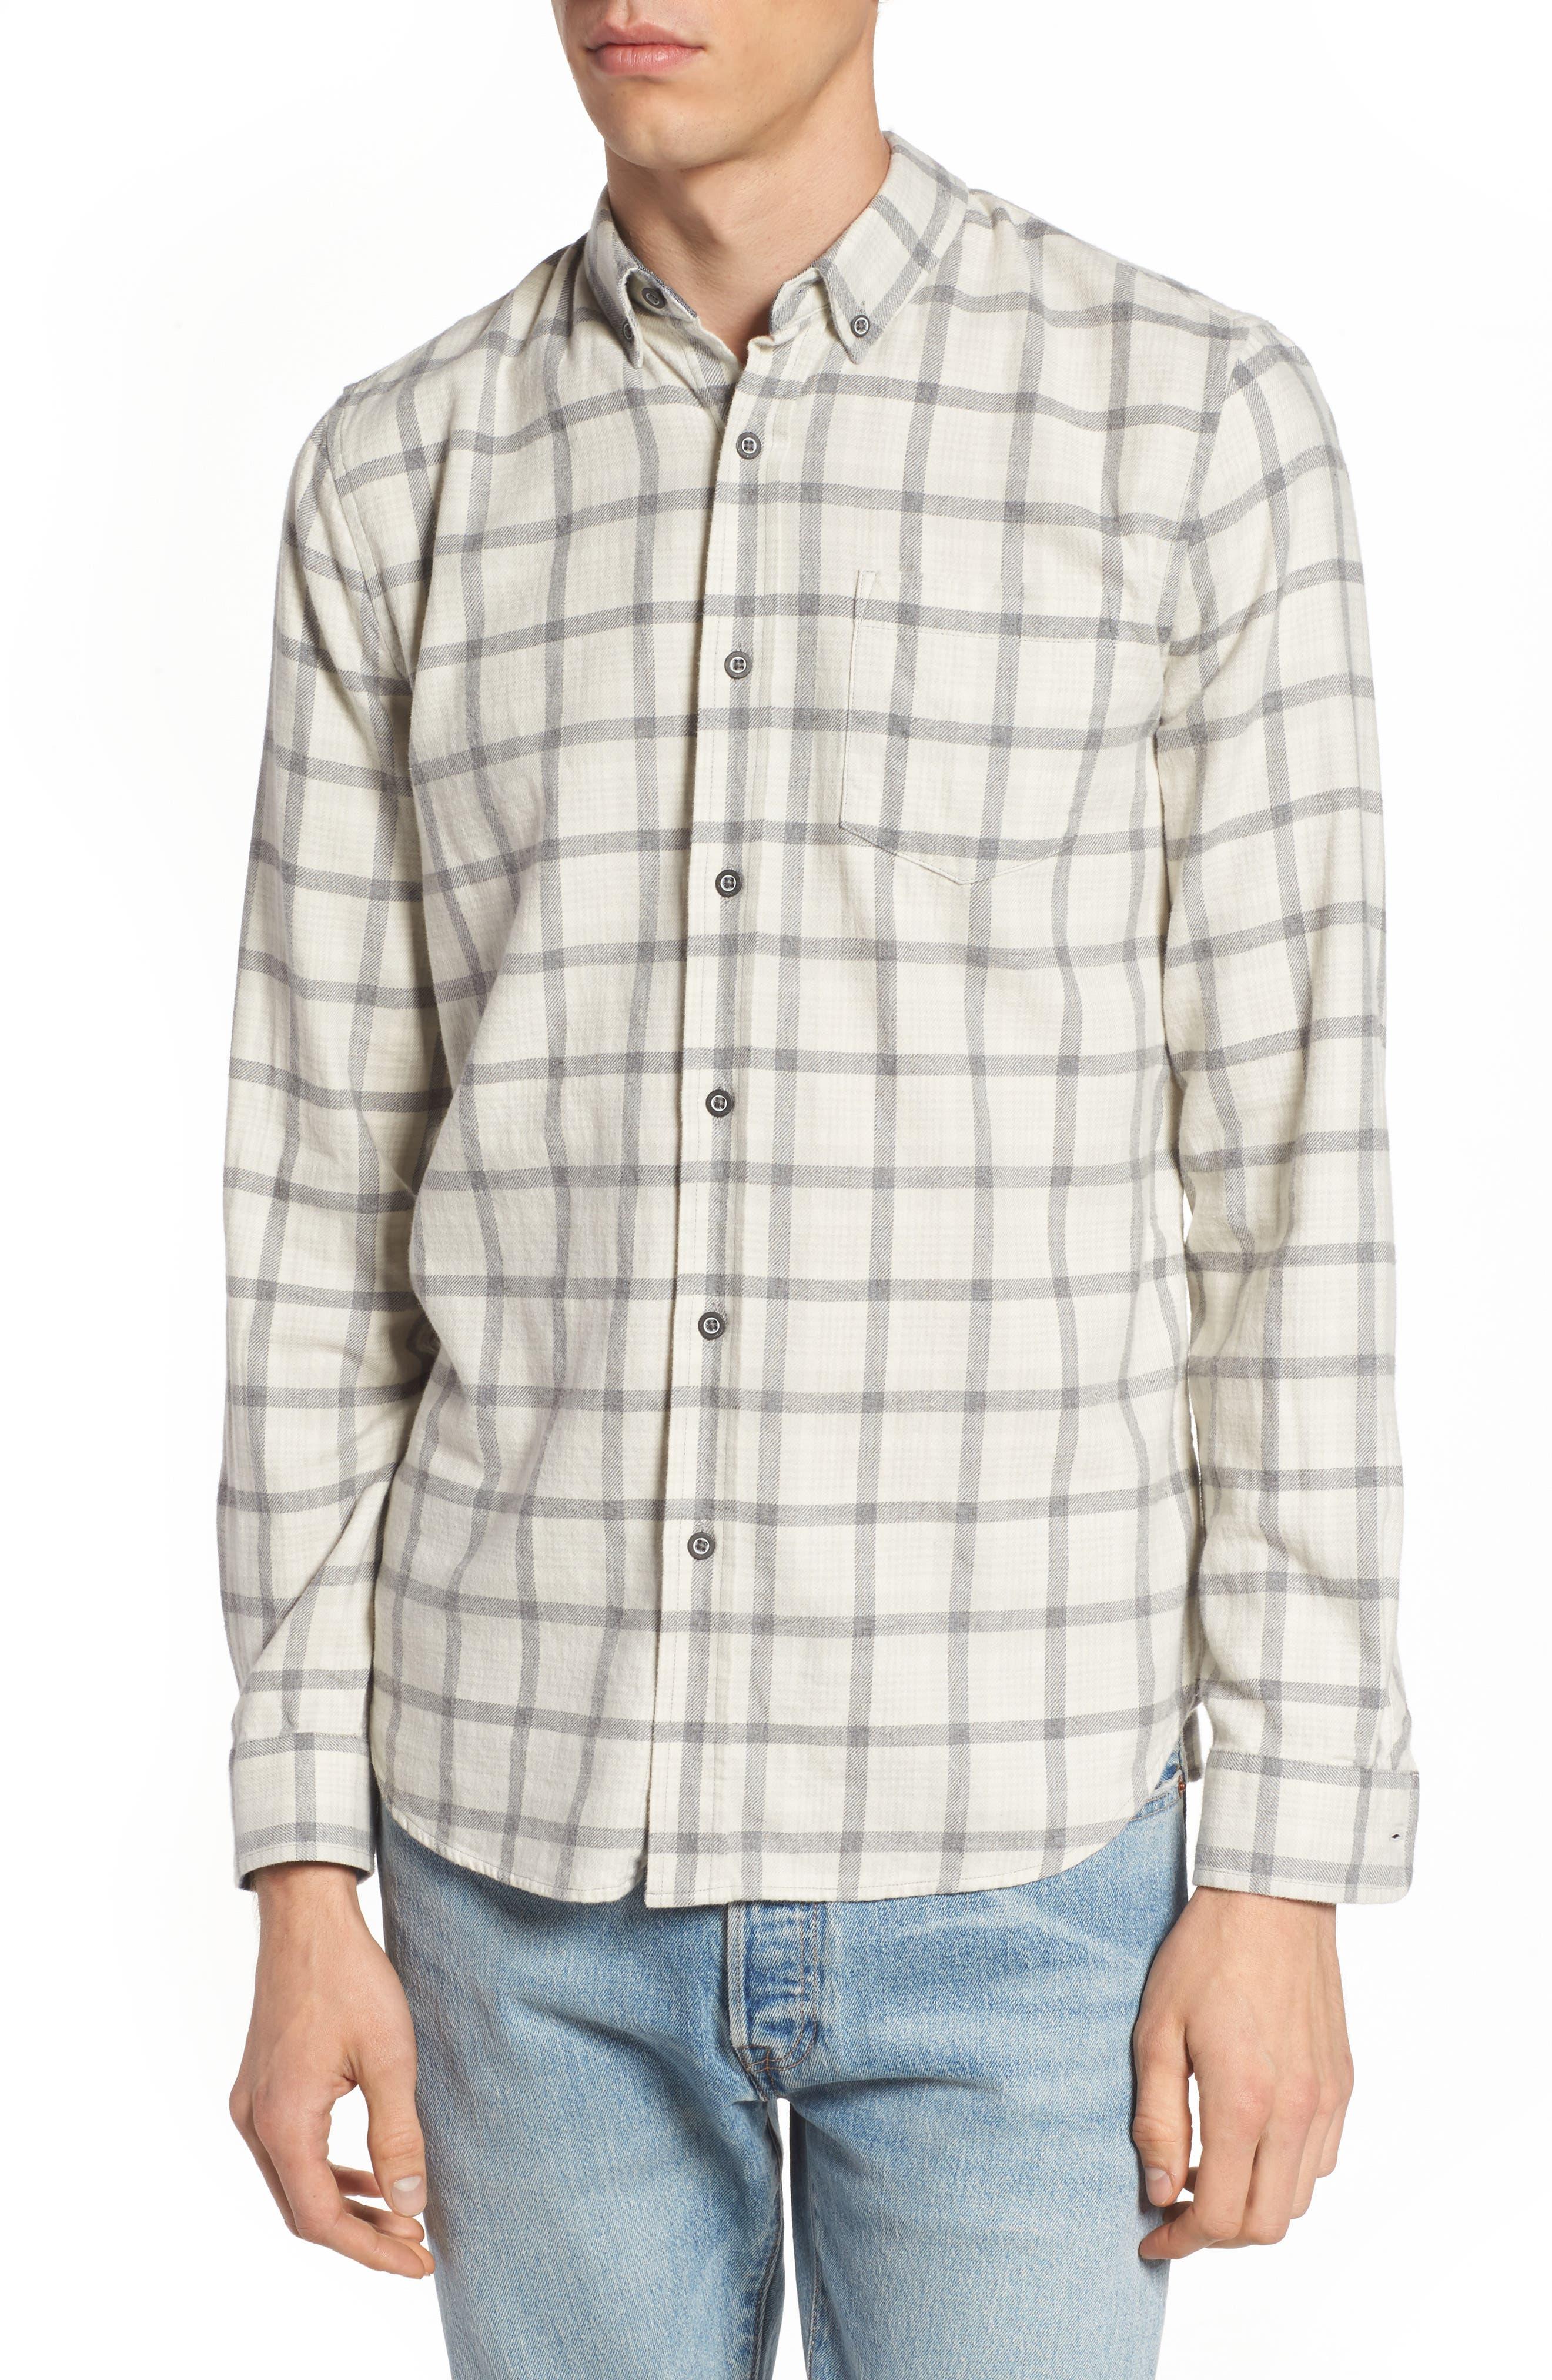 Main Image - AG Grady Slim Fit Plaid Sport Shirt